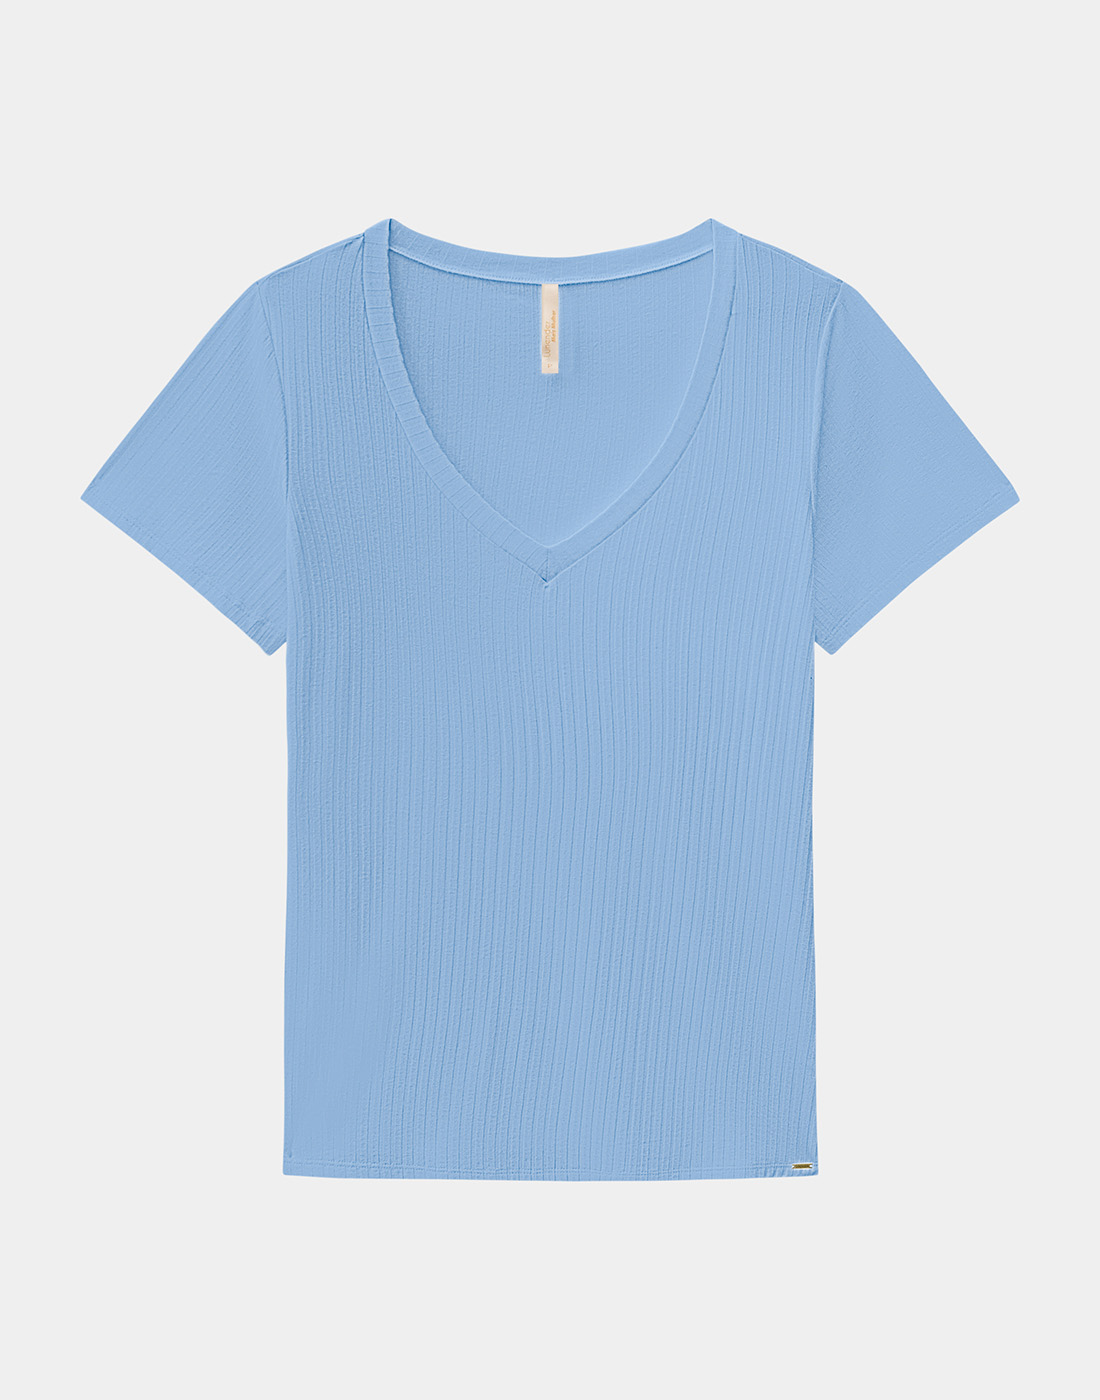 Blusa Básica Plus Size Malha Canelada Lunender Mais Mulher